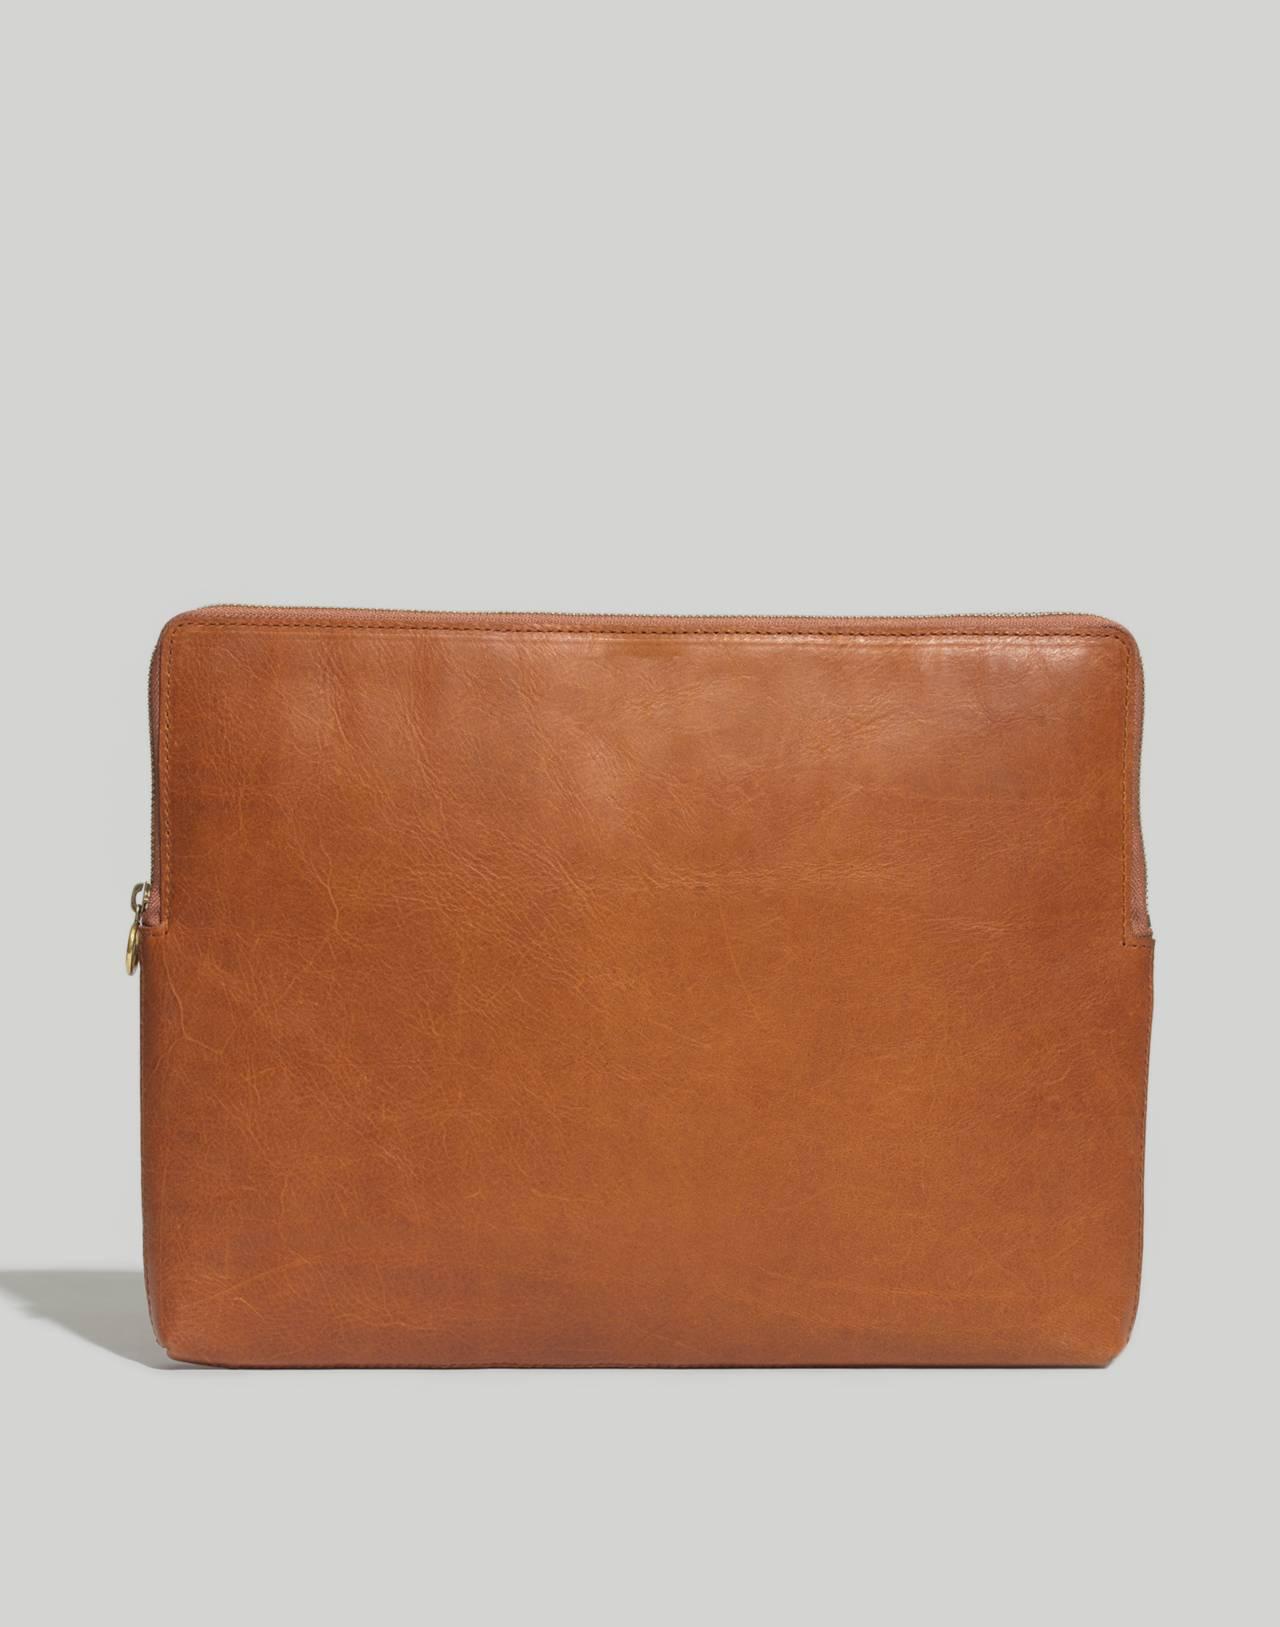 The Leather Laptop Case in english saddle image 1